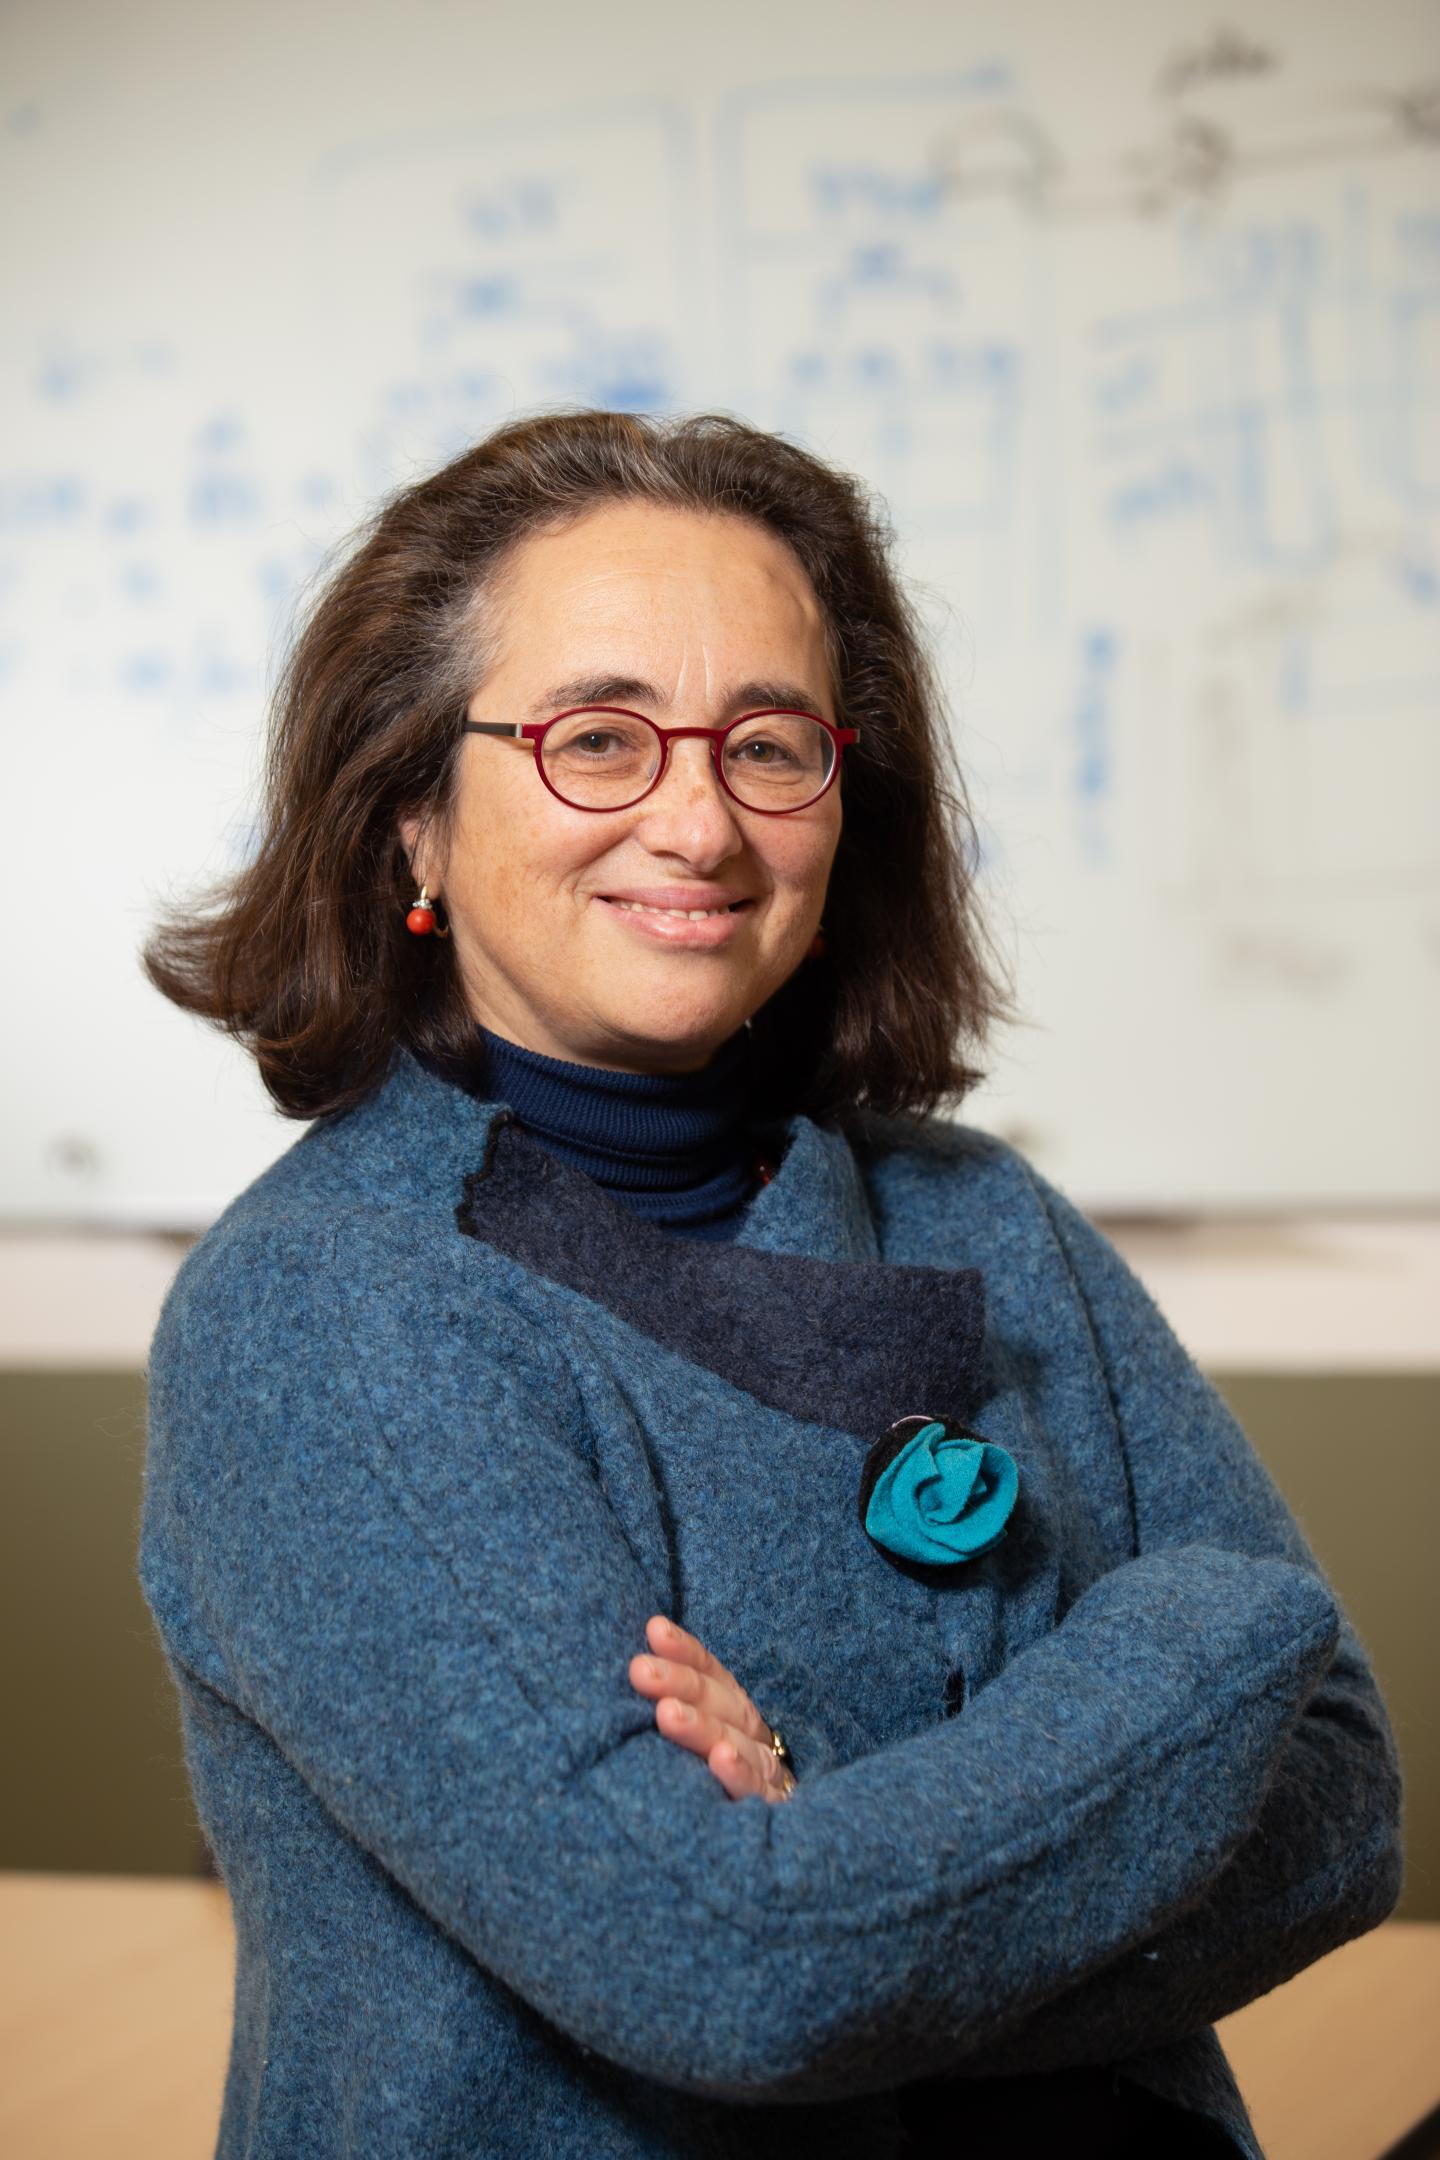 CZI Imaging Scientist Caterina Strambio De Castillia